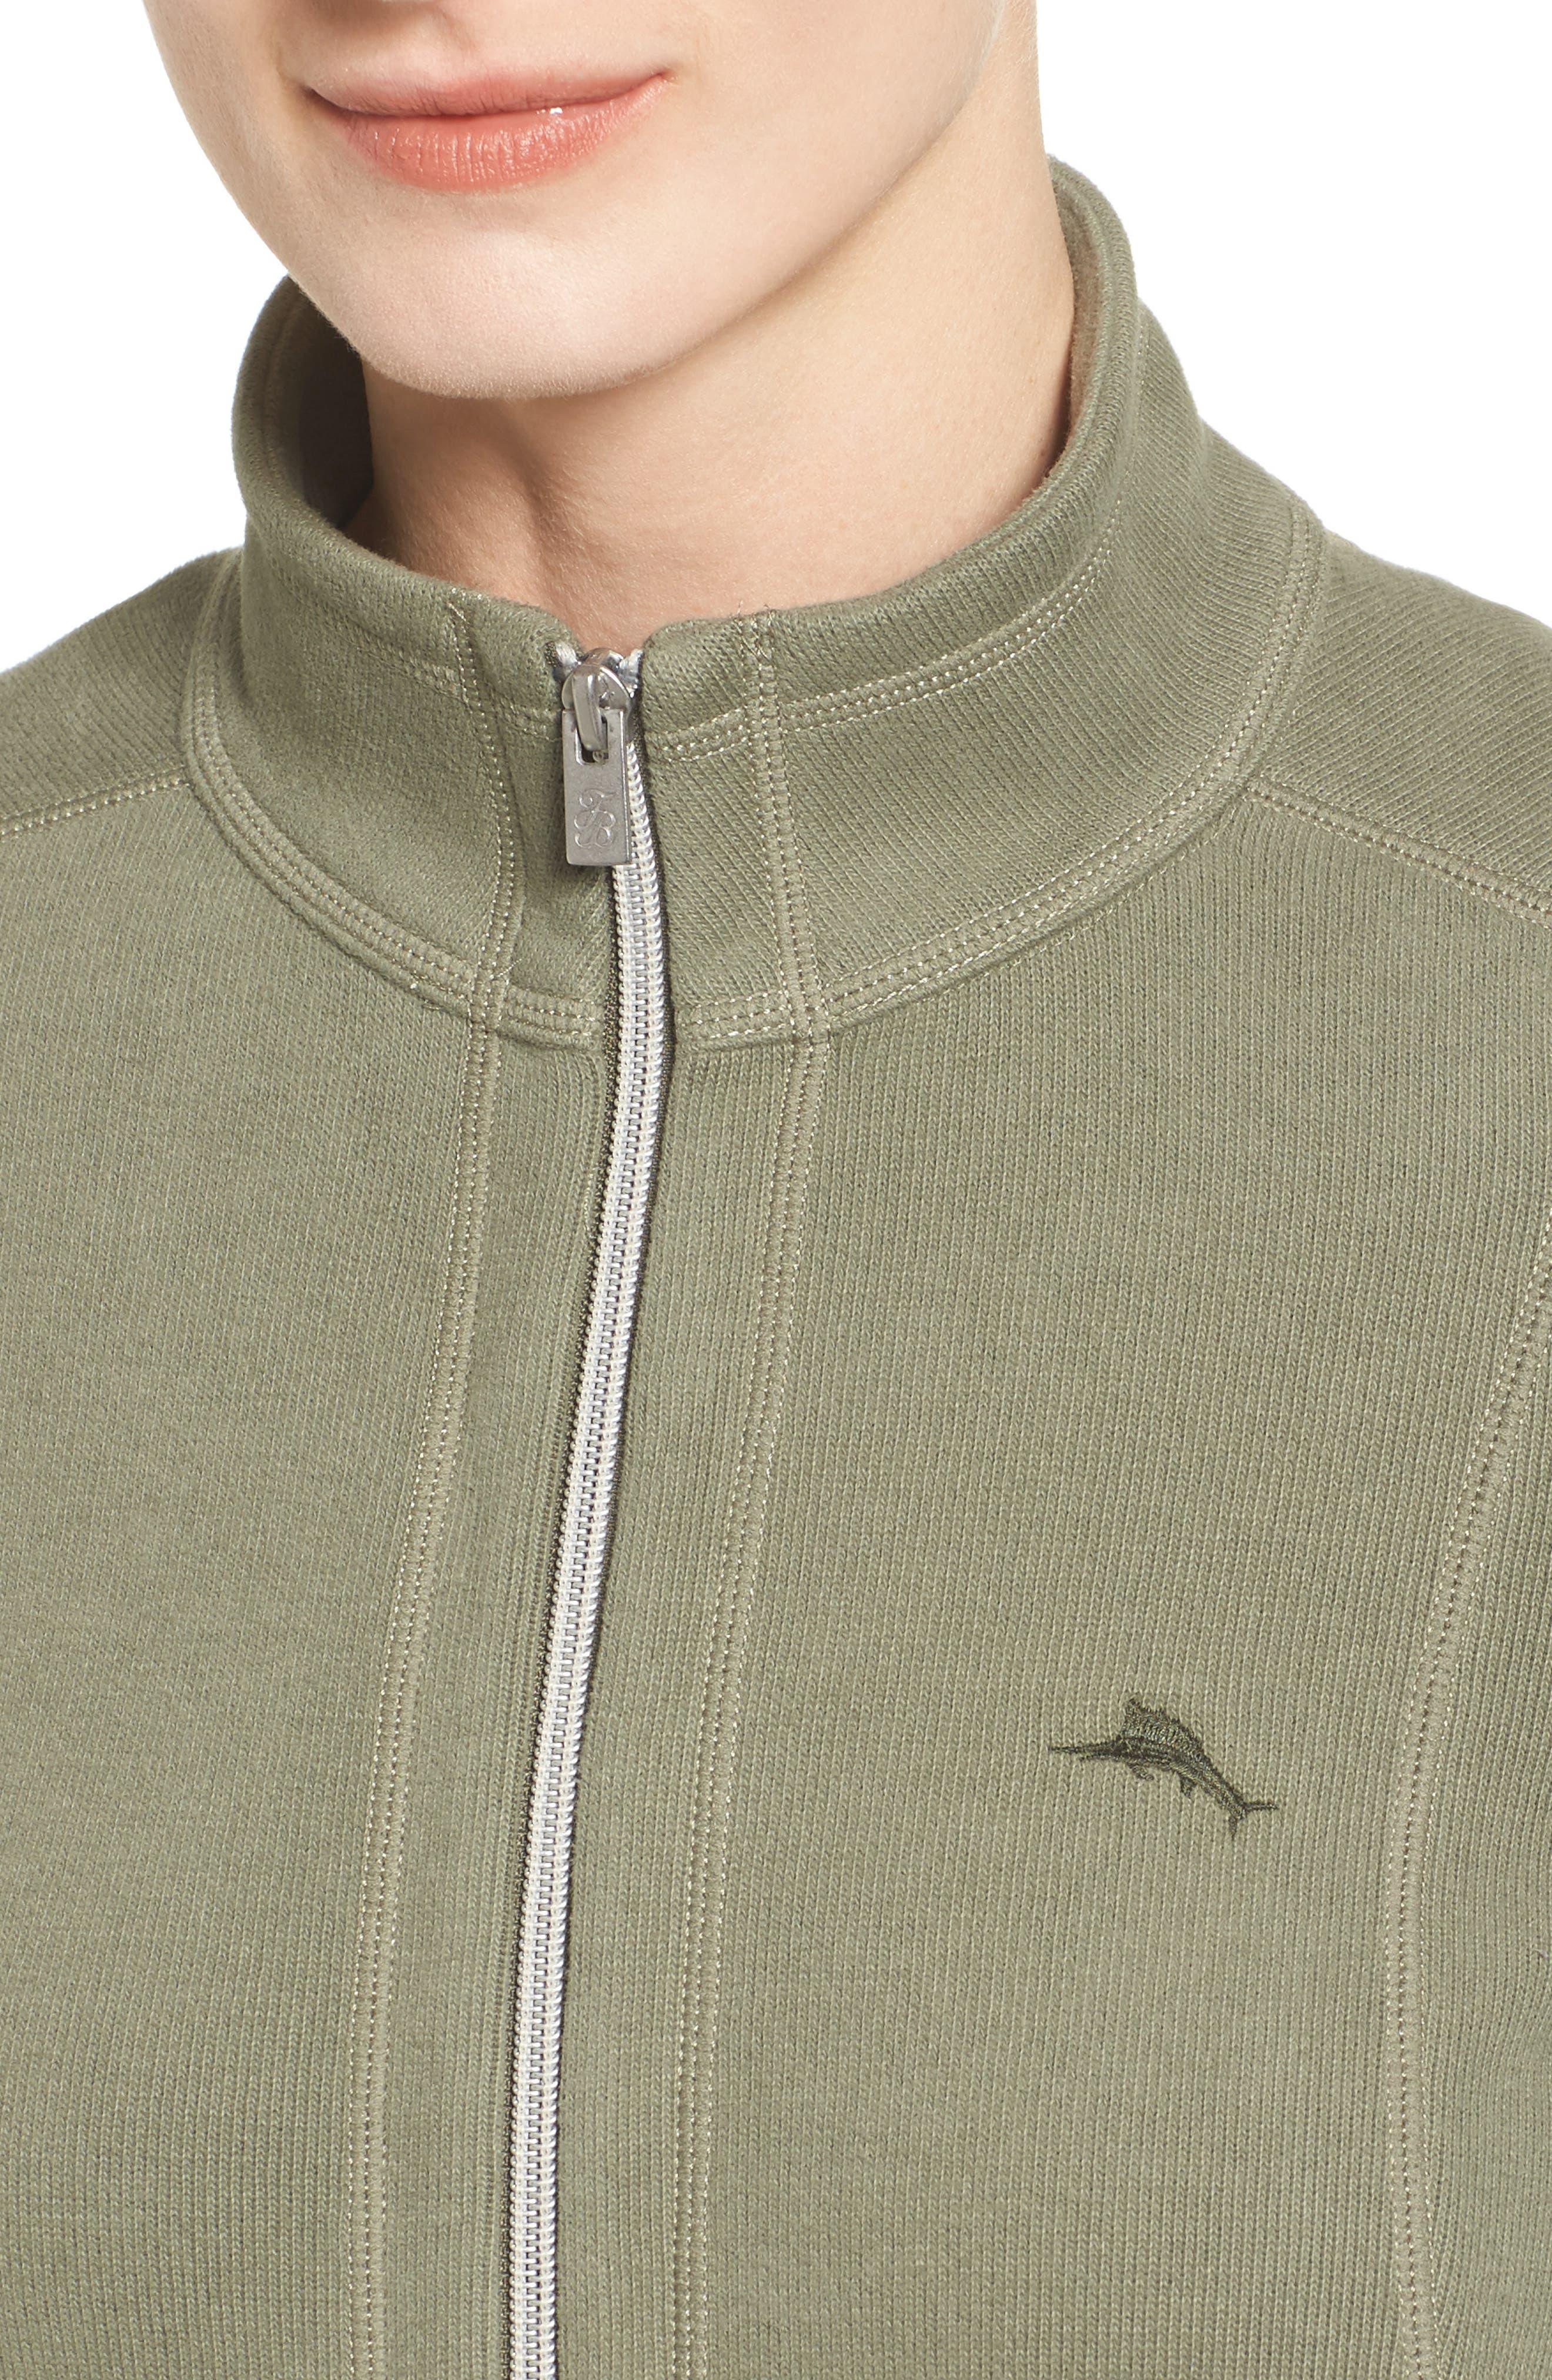 'Aruba' Full Zip Sweatshirt,                             Alternate thumbnail 27, color,